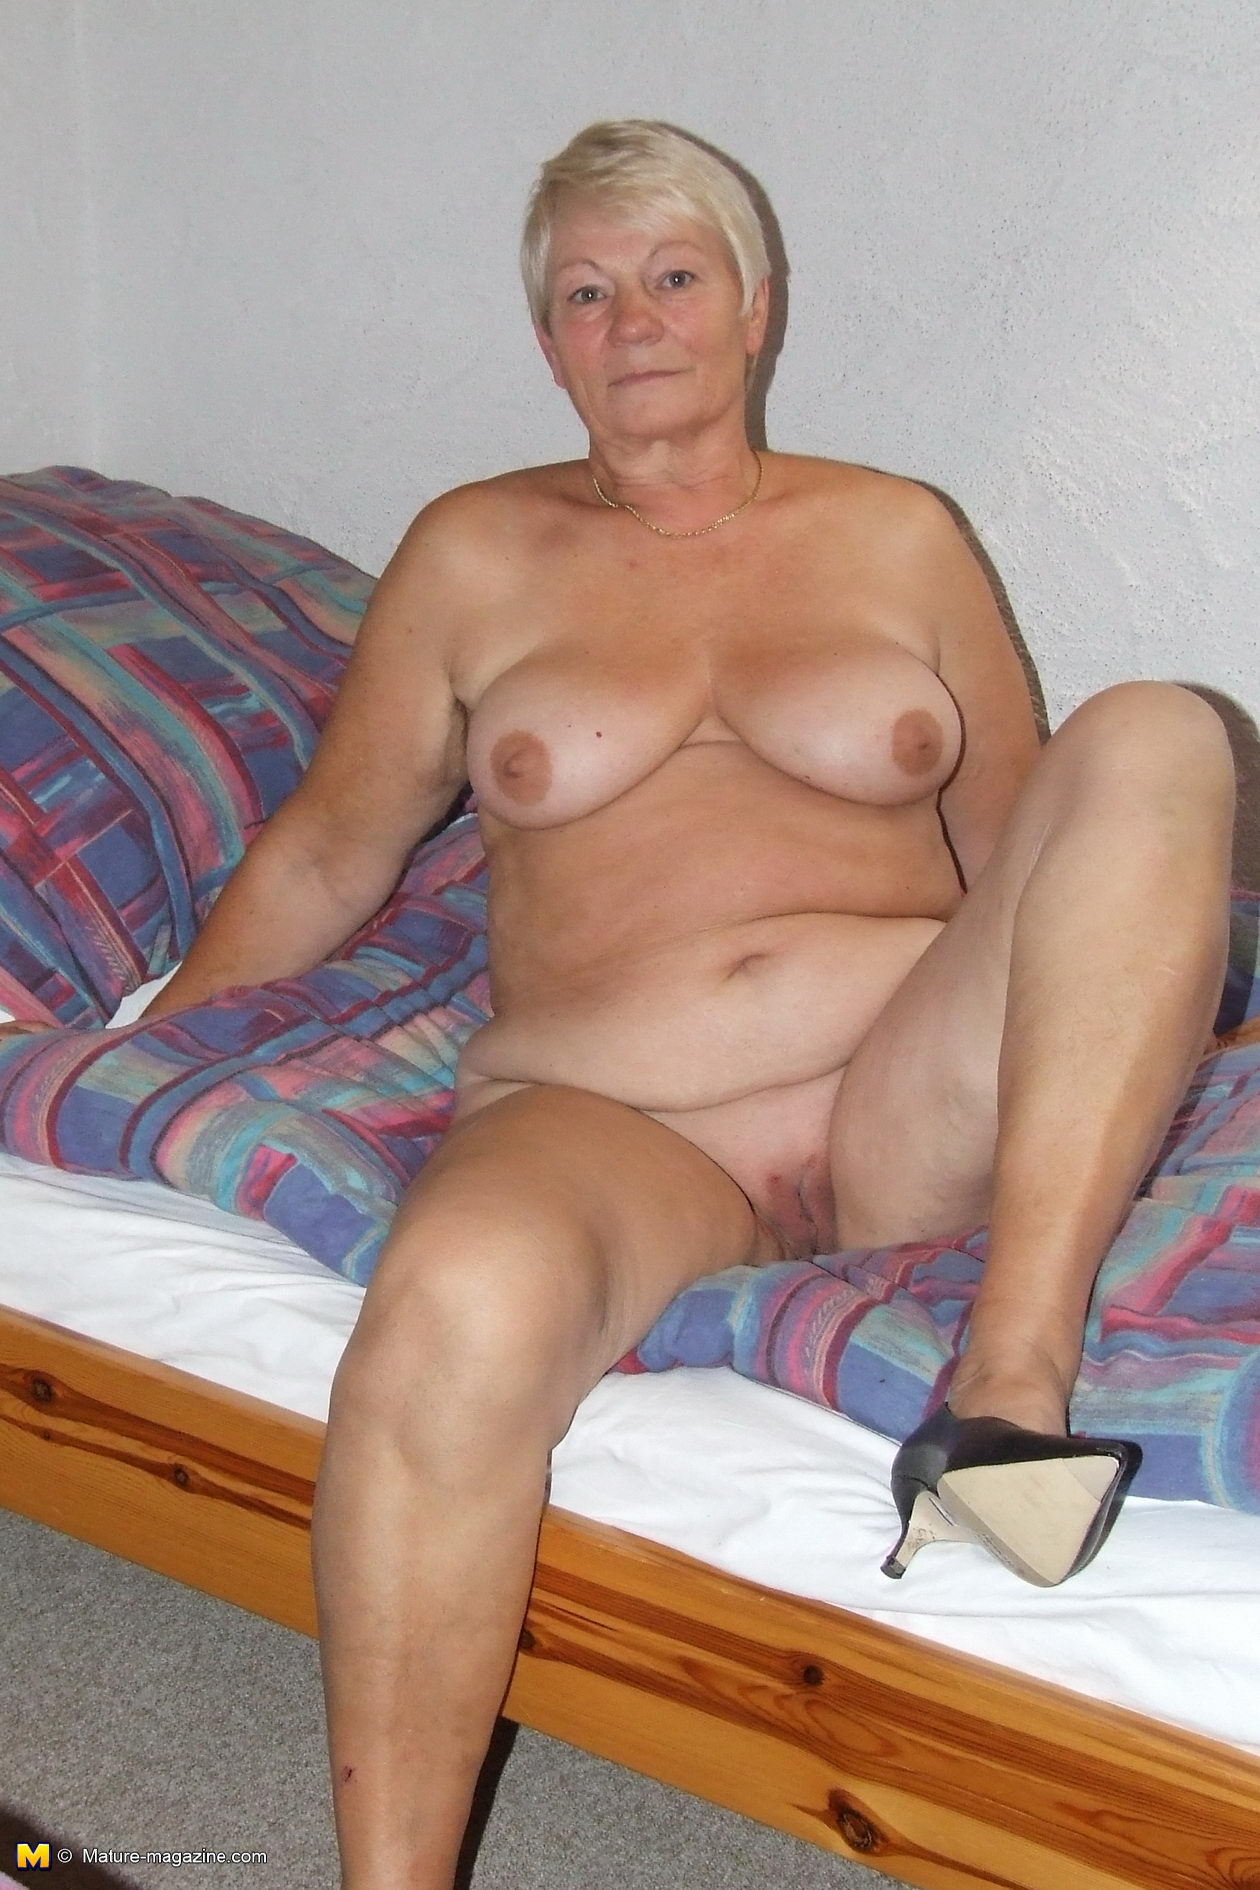 amy adams hot naked body